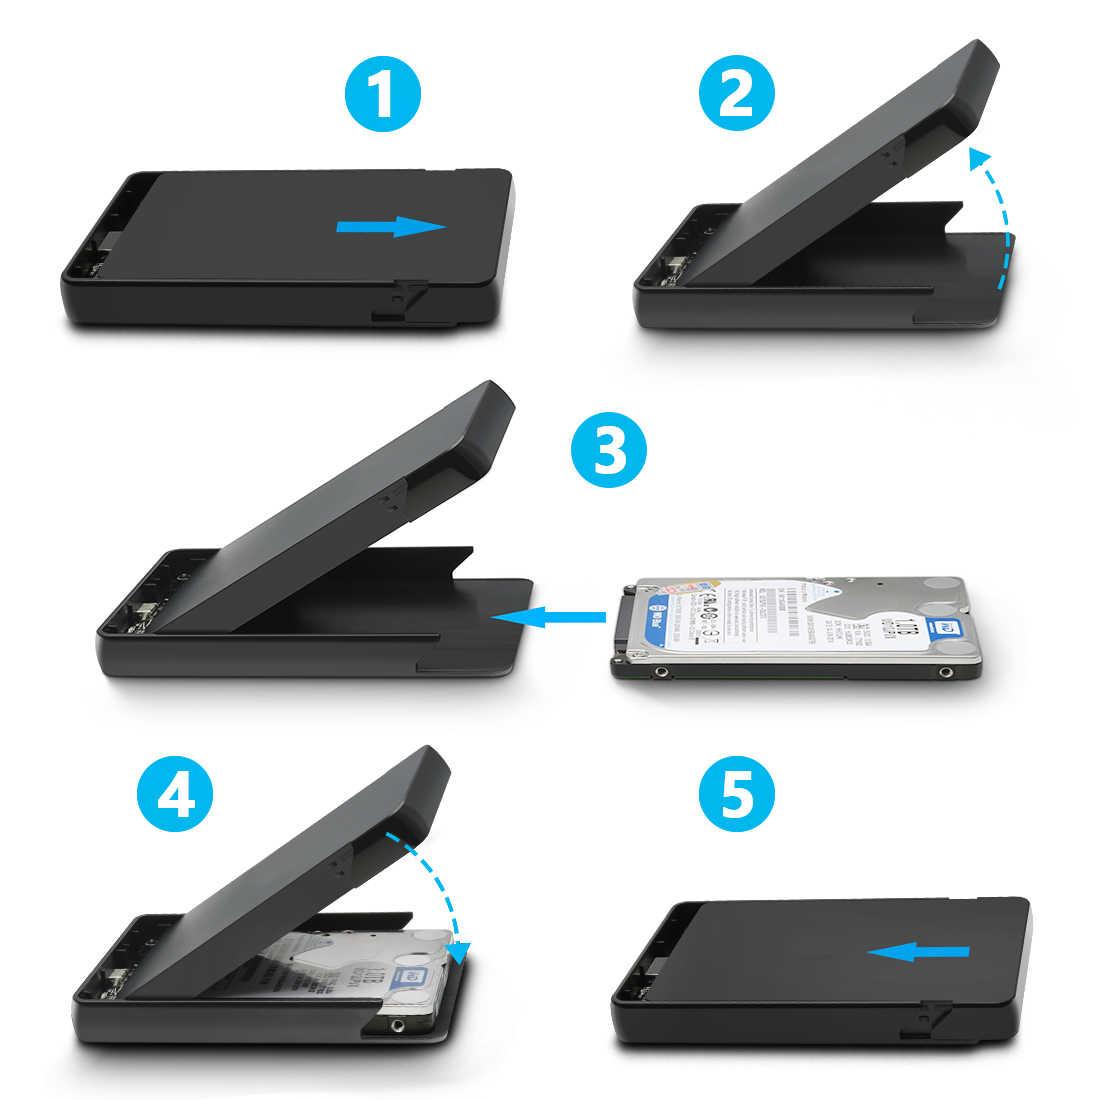 Rocketek Caso HDD de 2.5 polegadas SATA para USB 3.0 Adaptador SSD Hdd Hard Disk Drive Caixa Externa para Notebook PC Desktop